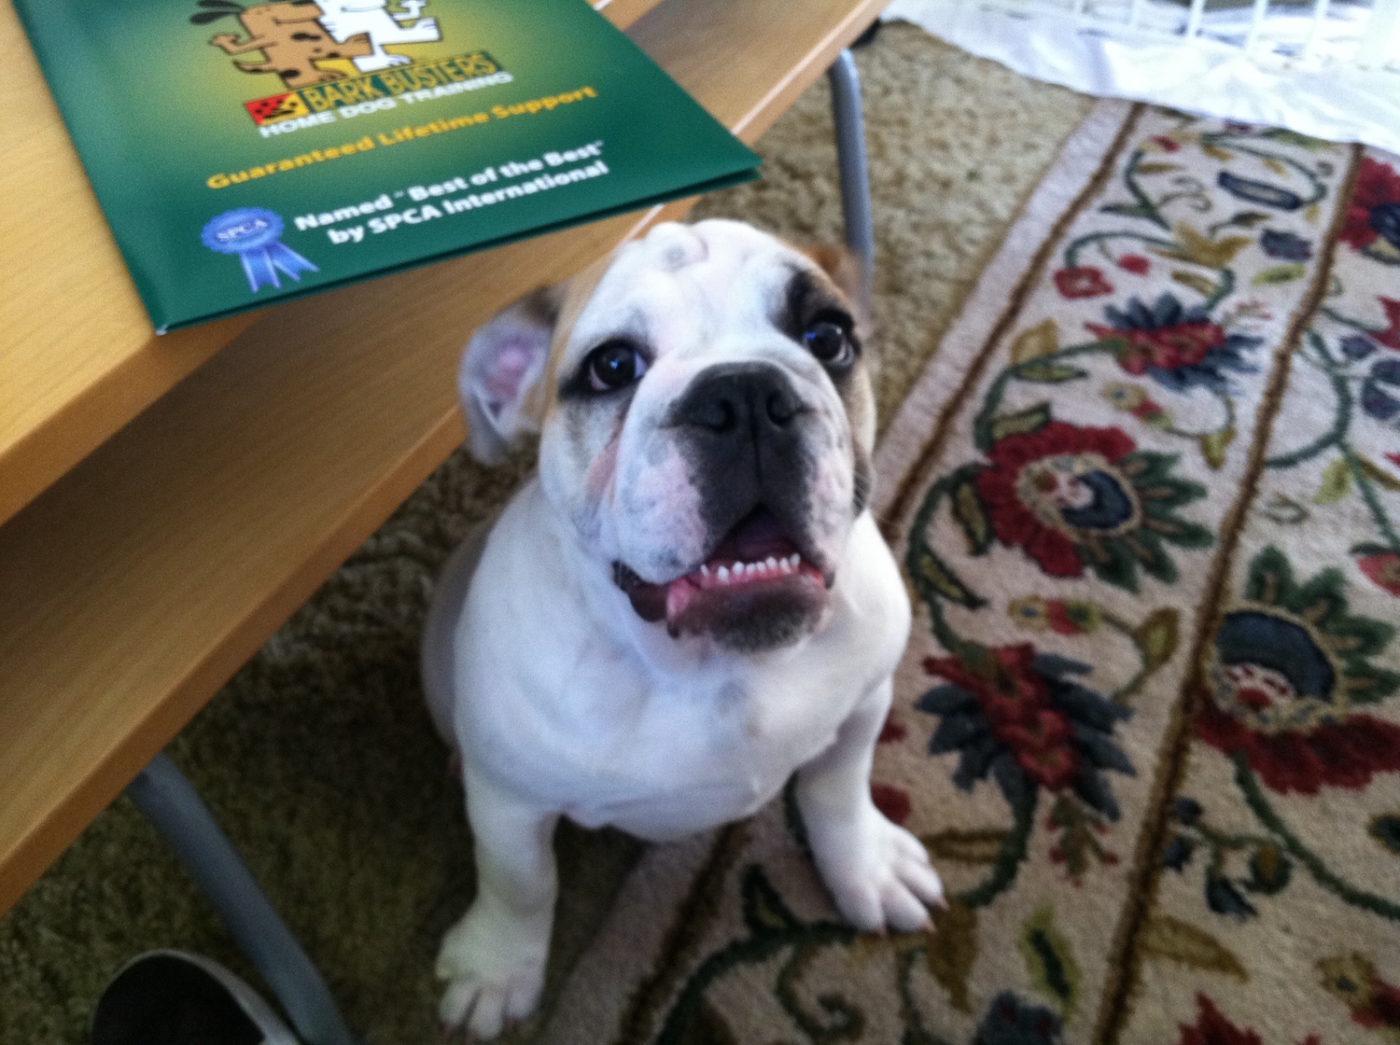 #dogobediencetraining, #basicdogobedience, #puppytraining